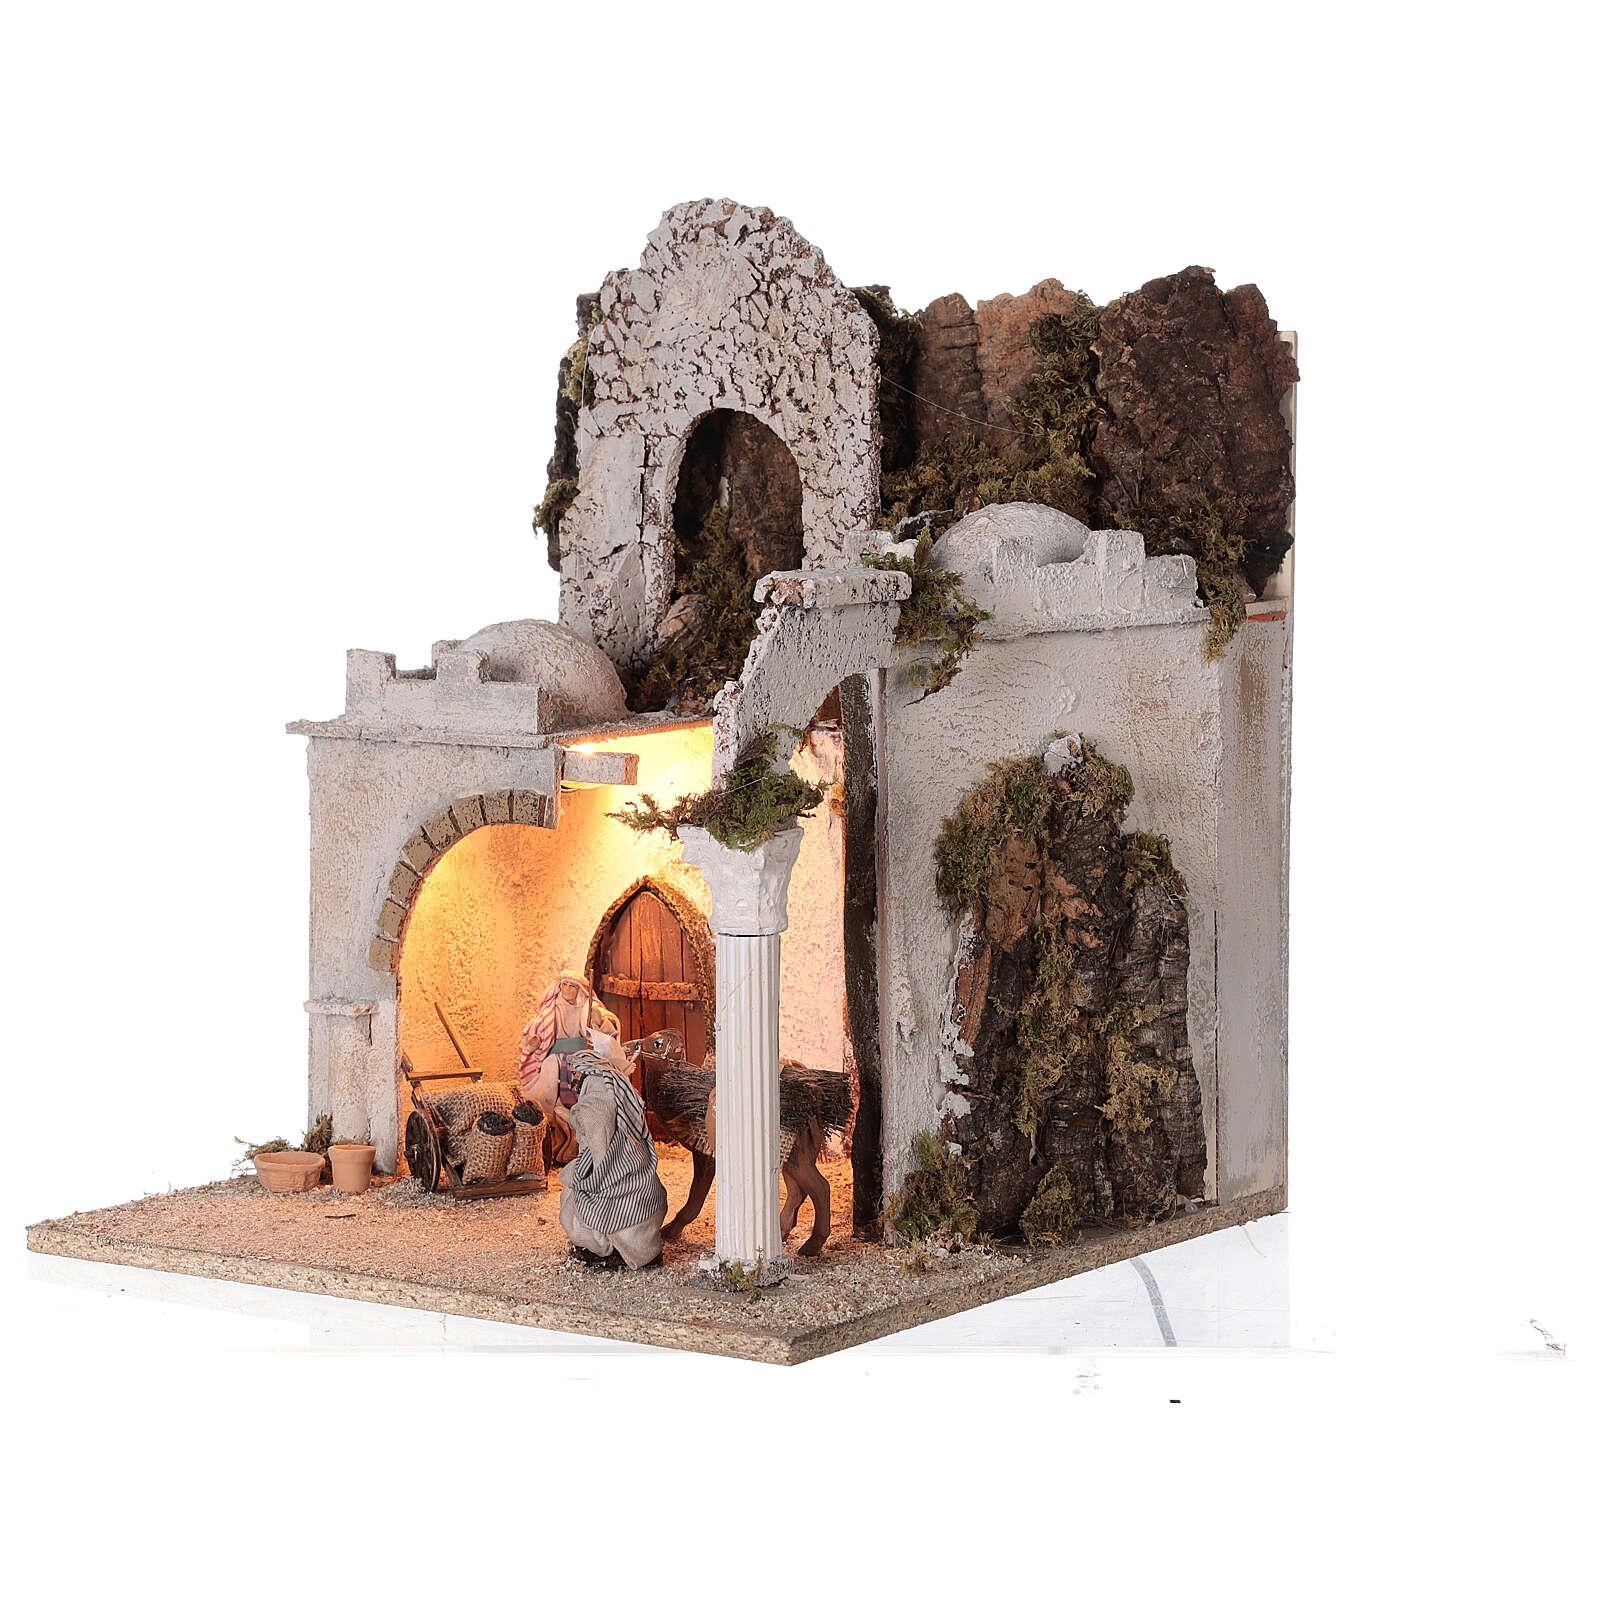 Presepe completo arabo modulare 45x210x35 statue terracotta 8 cm presepe napoletano 4